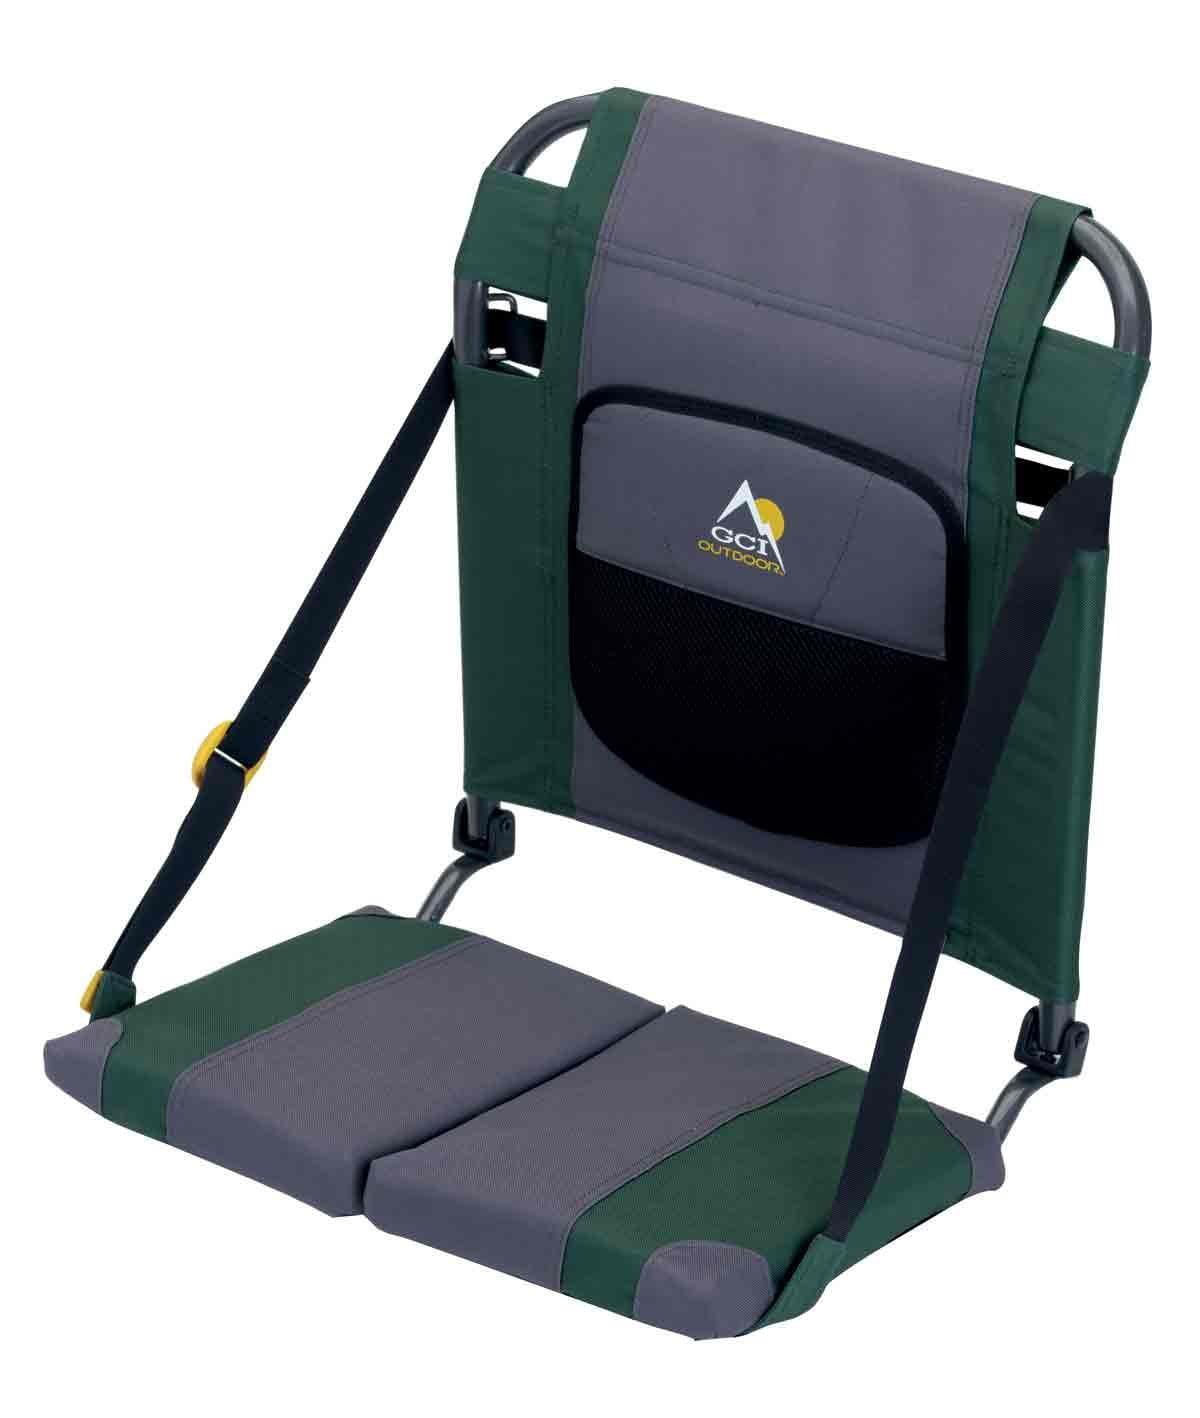 canoe chair bedroom price sitbacker hunter walmart com departments